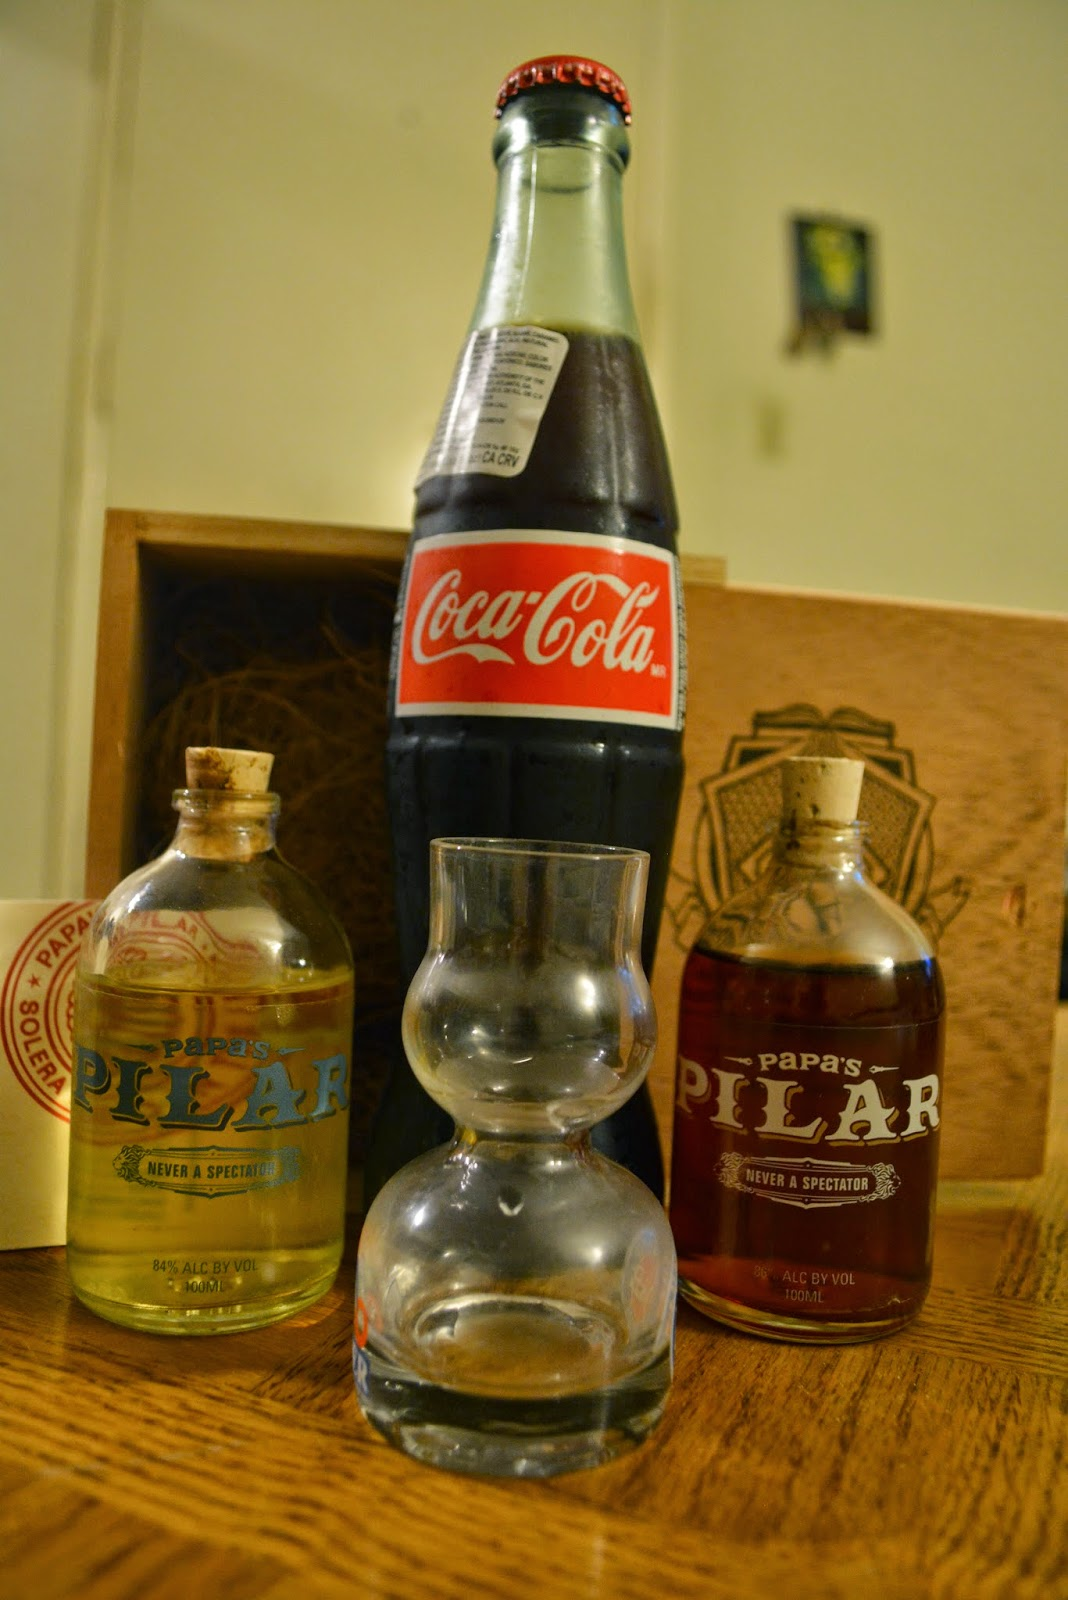 Papas Pilar Rum! - Review of Key West First Legal Rum ...